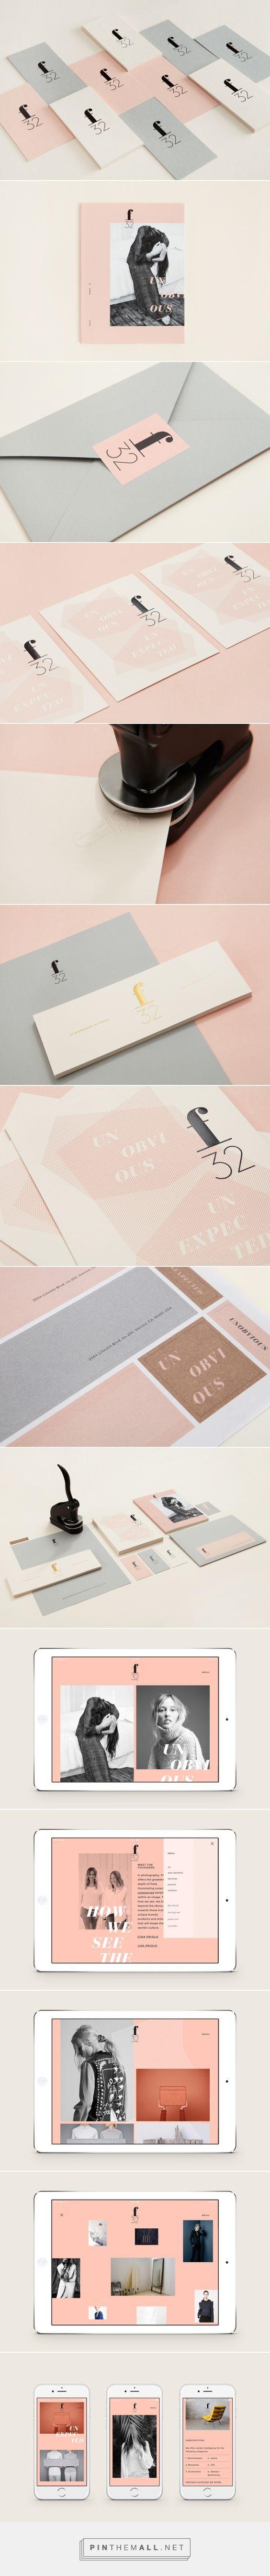 #Marque féminine. Rose et gris. Identité visuelle sophistiquée.  Girly #brand. Pink and gray. Sophisticated #identity.: